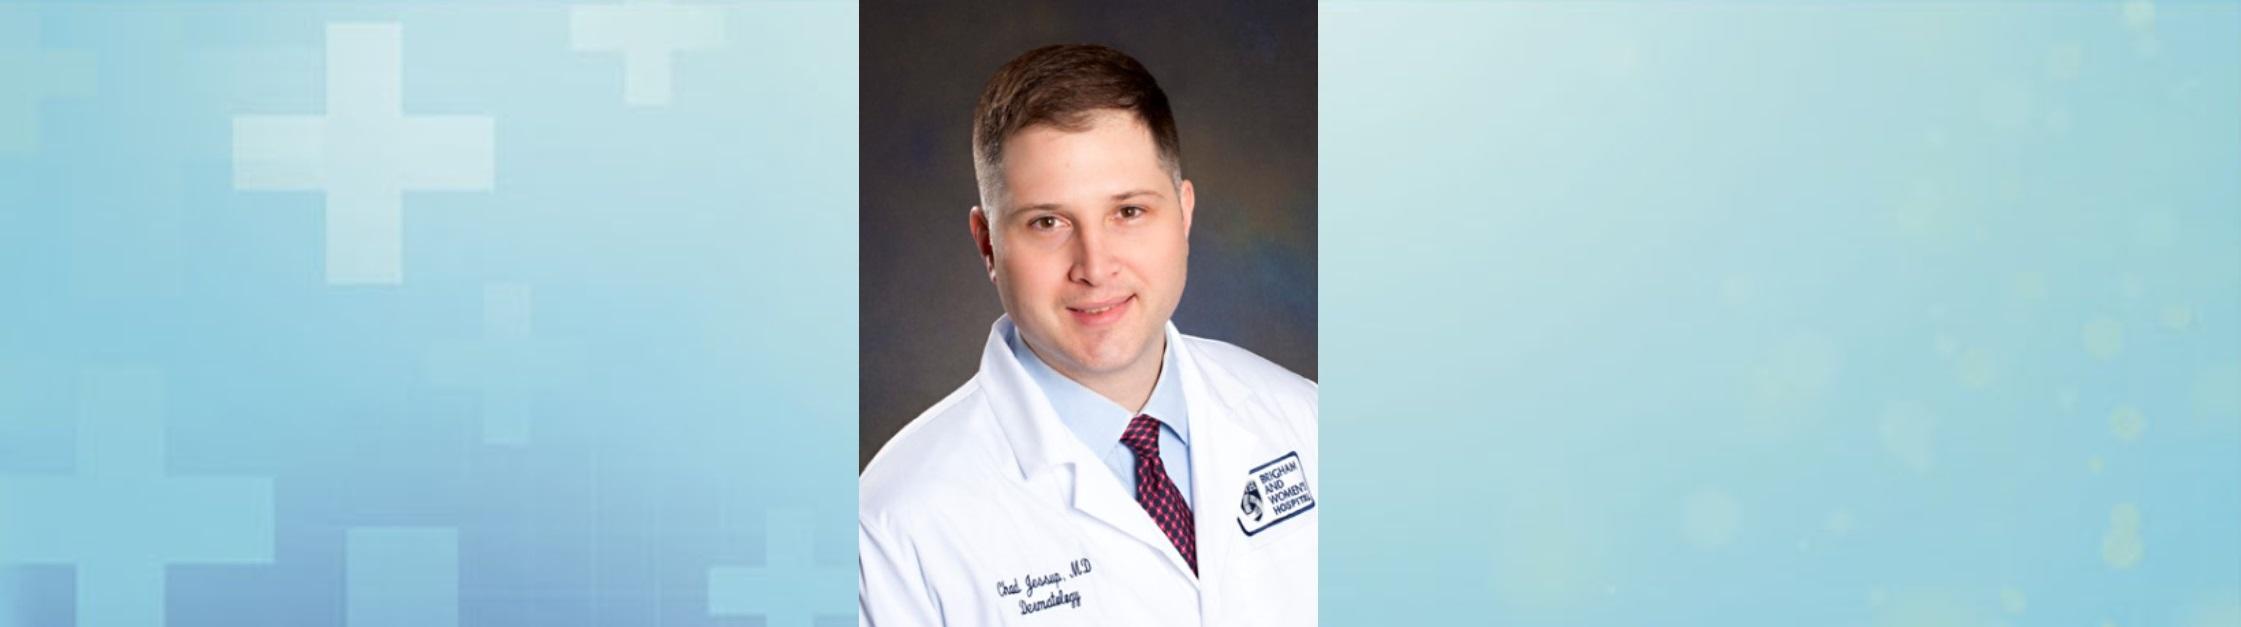 Jessup joins Brigham Dermatology Associates at Brigham and